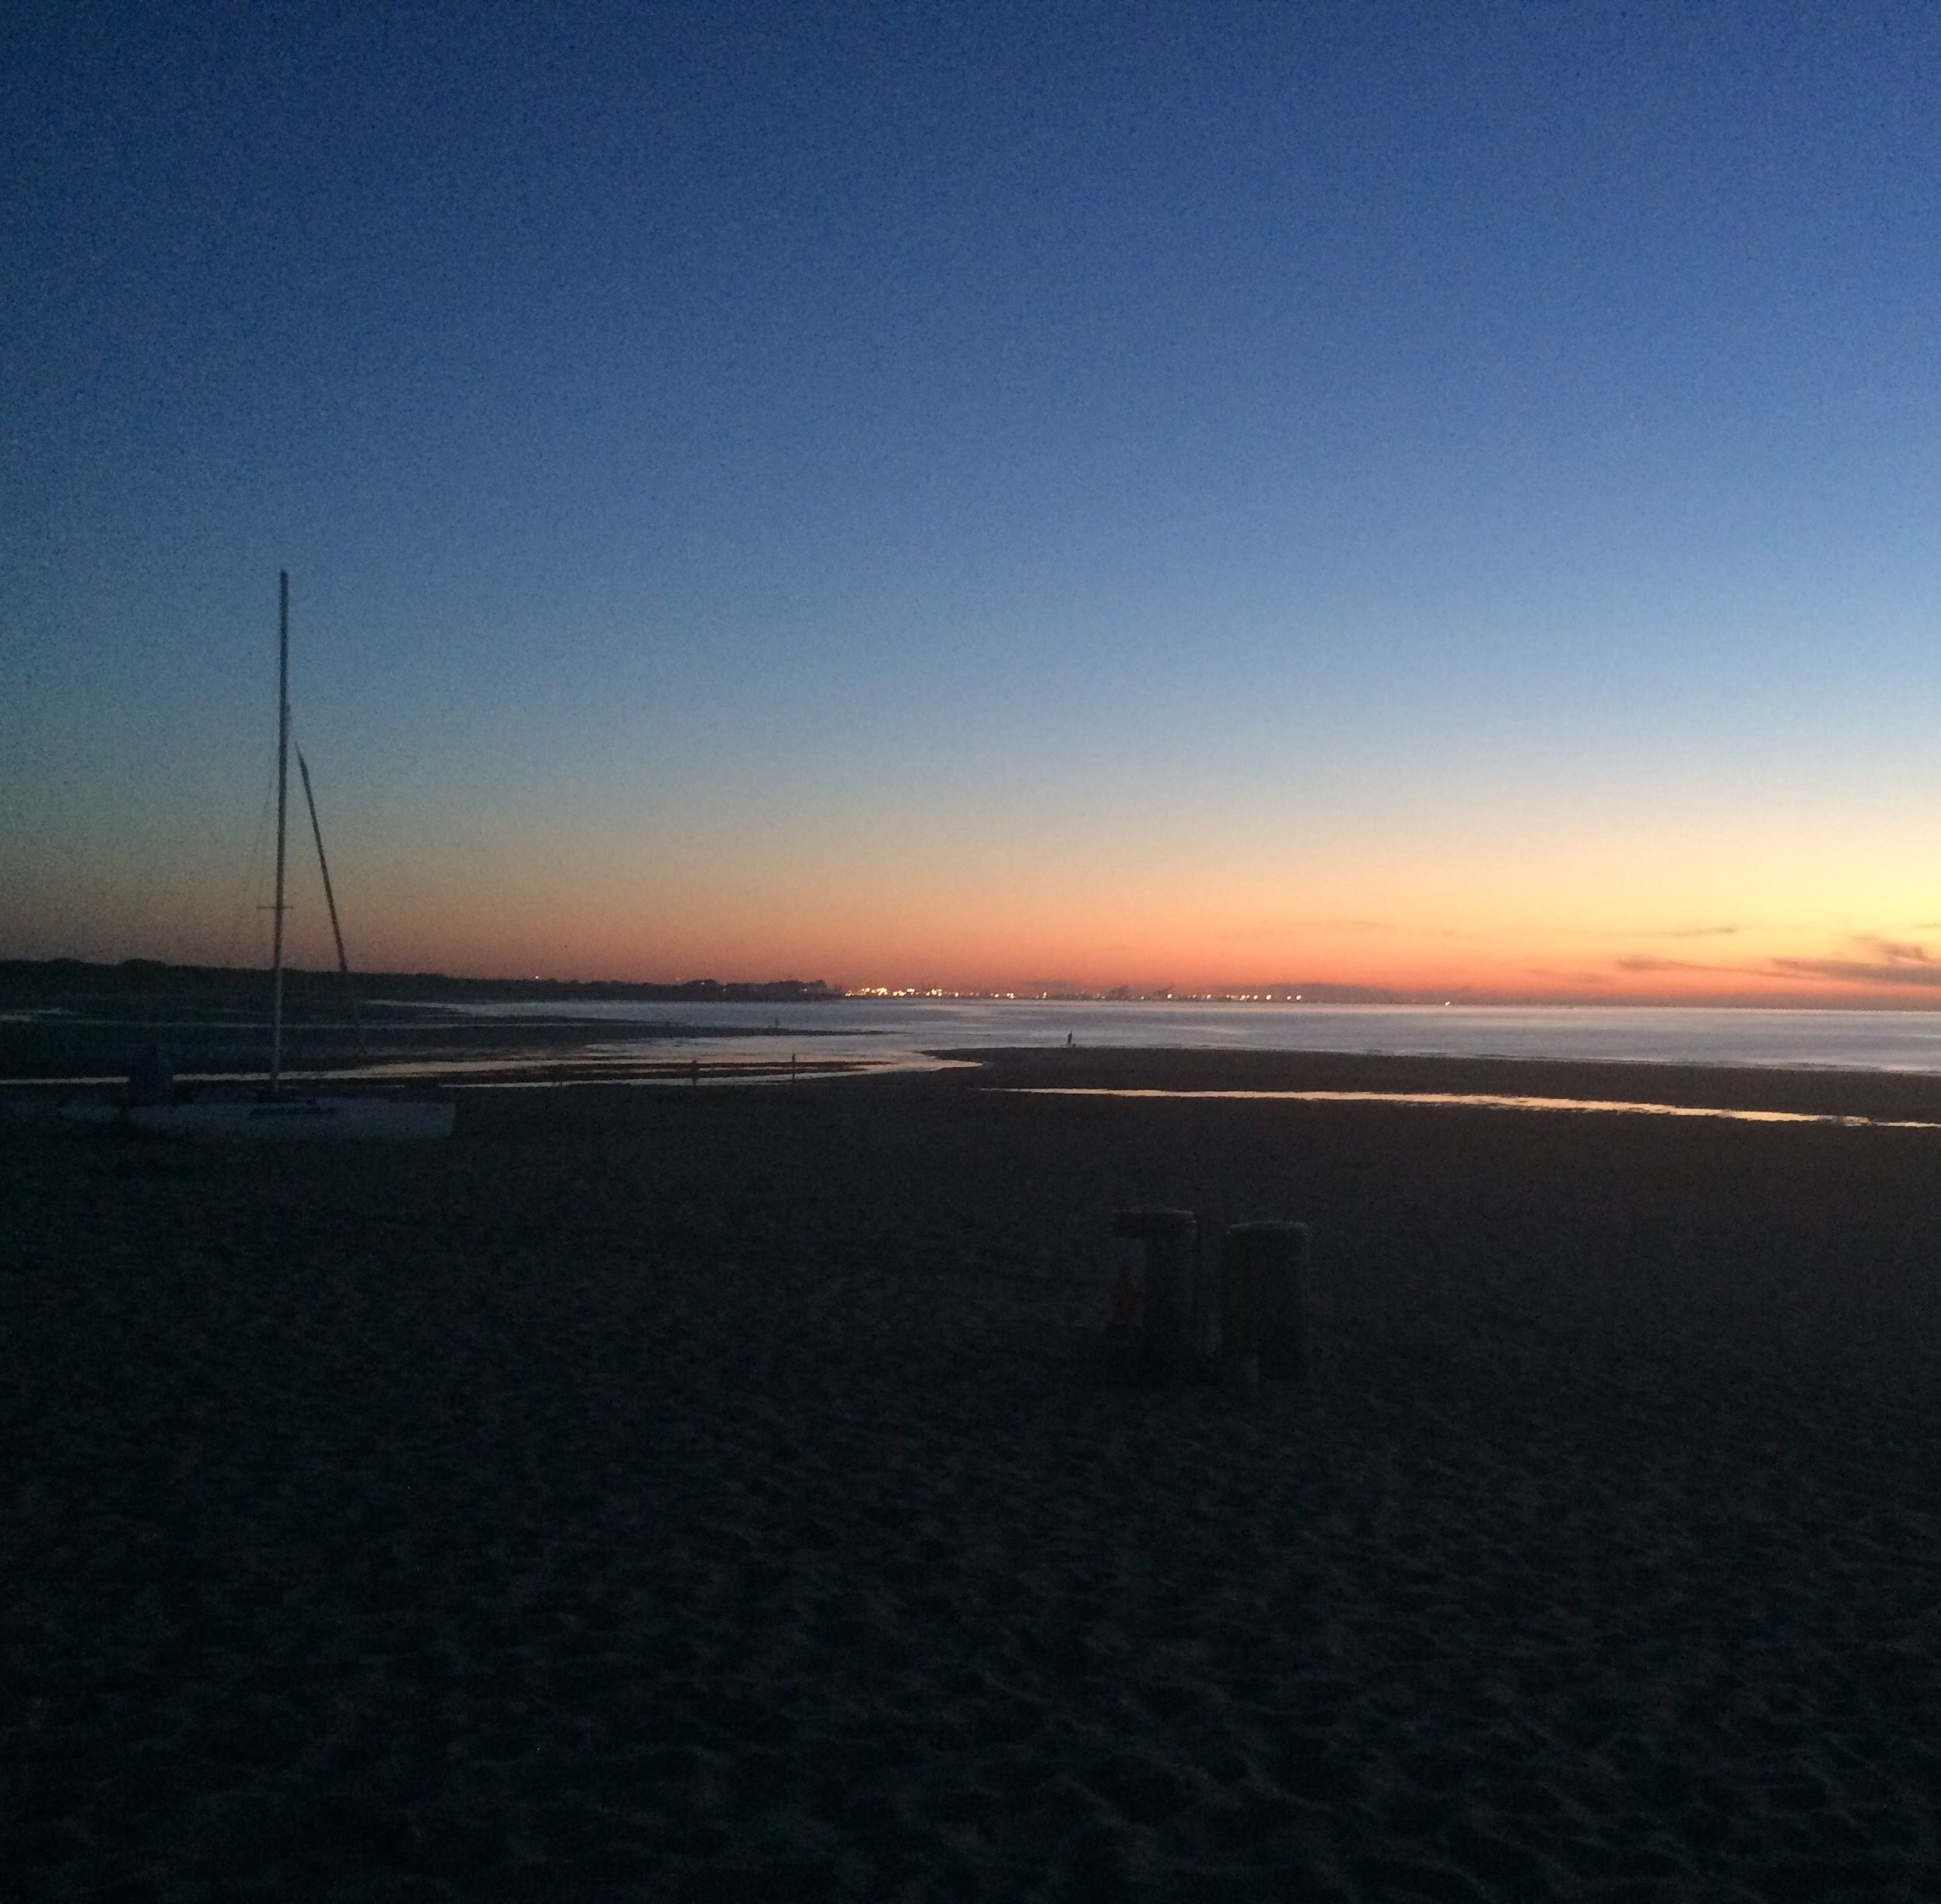 Cadzand Bad /Zeeland Sonnenuntergang